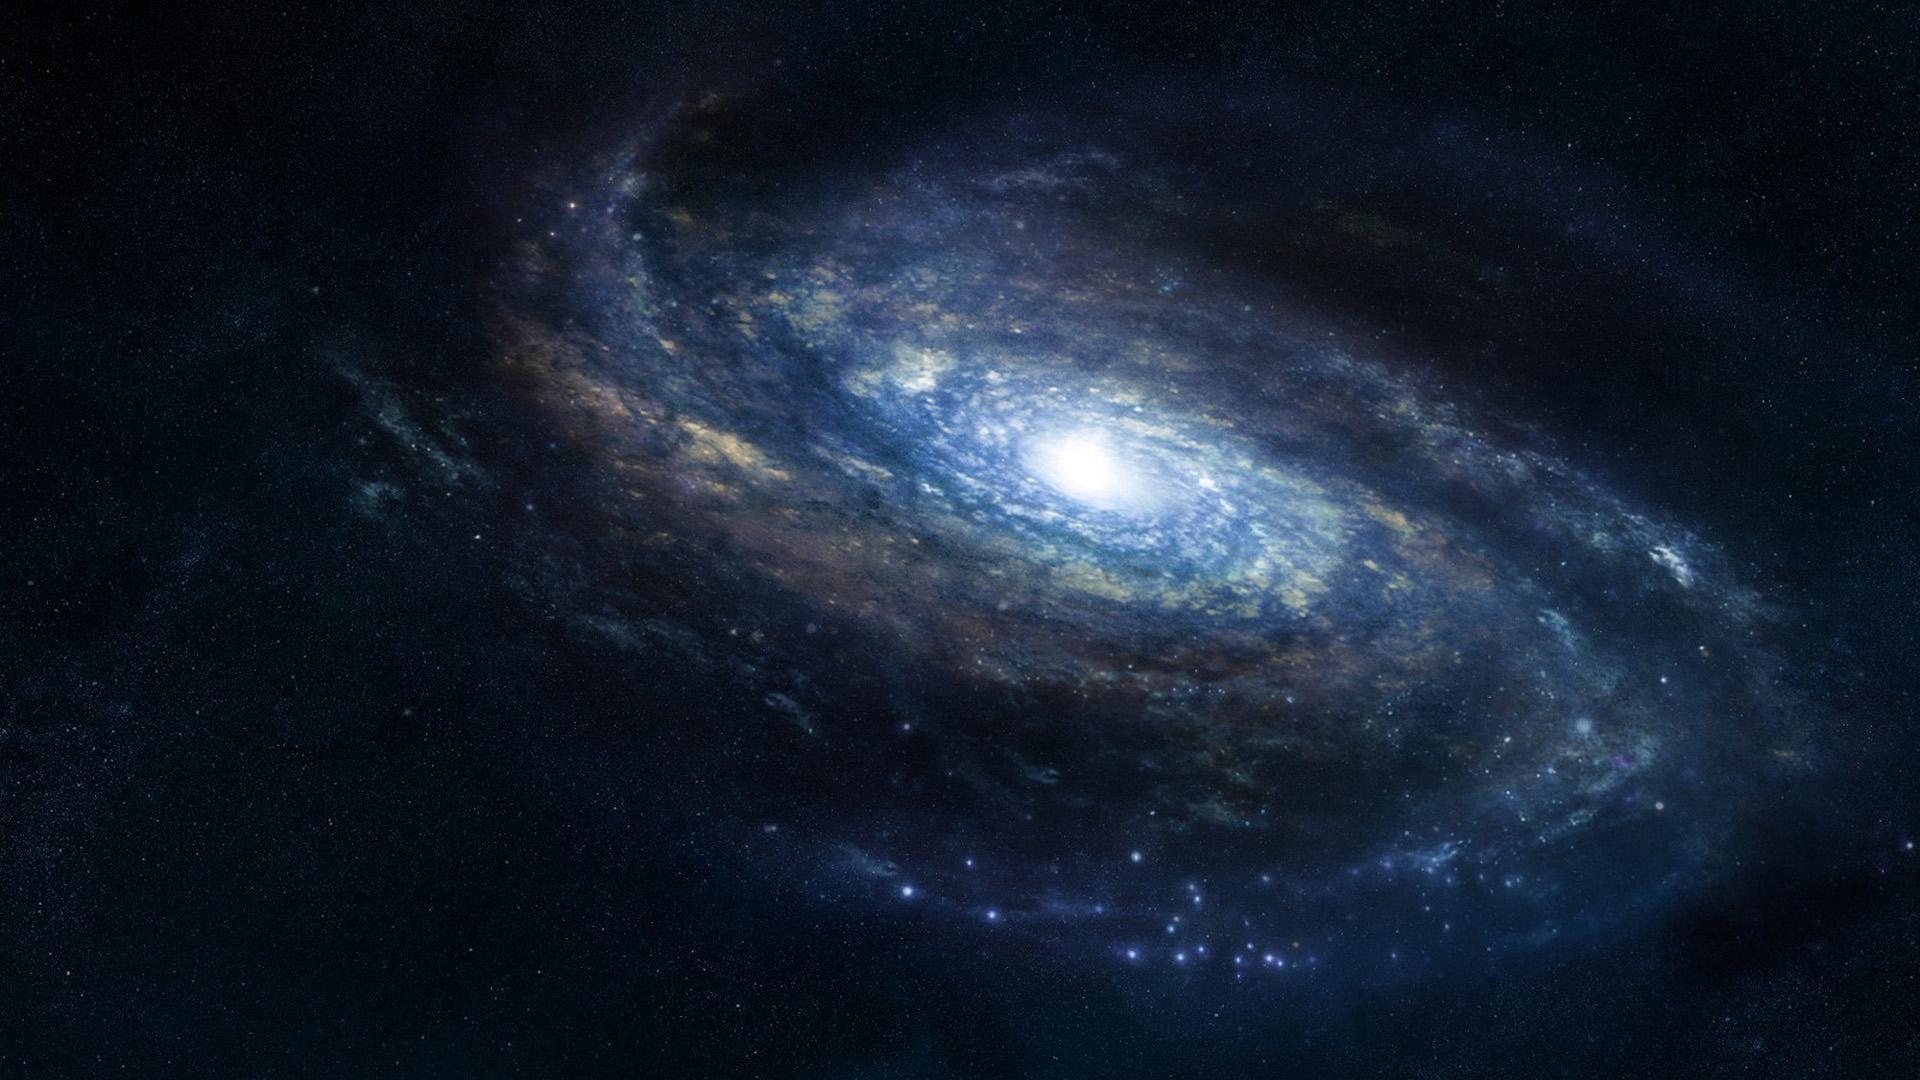 1080x1920 Space War Blue Storm Star Illust IPhone 7 Wallpaper